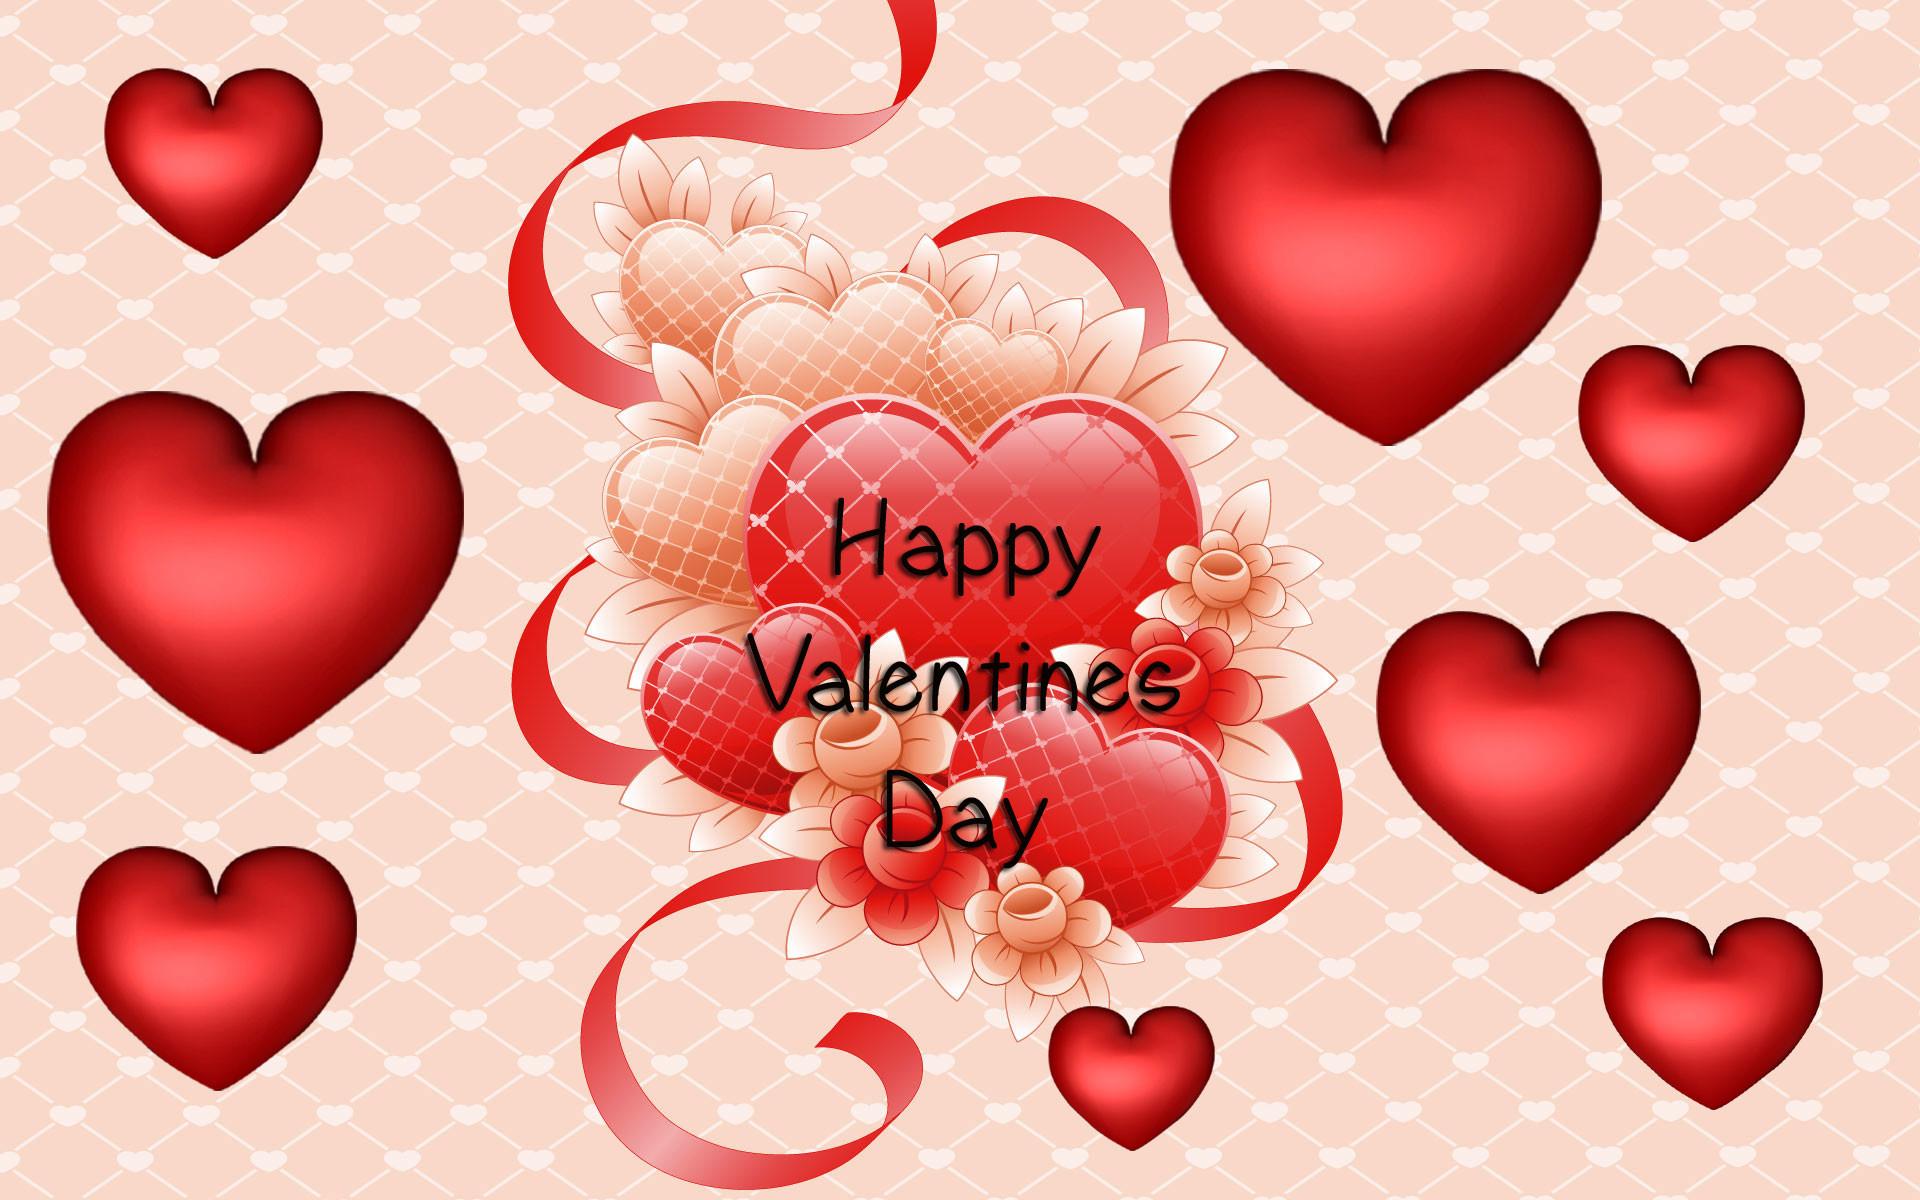 1920x1200 valentine screensavers 485217 valentine screensavers 479736 - Valentines Day Screensavers